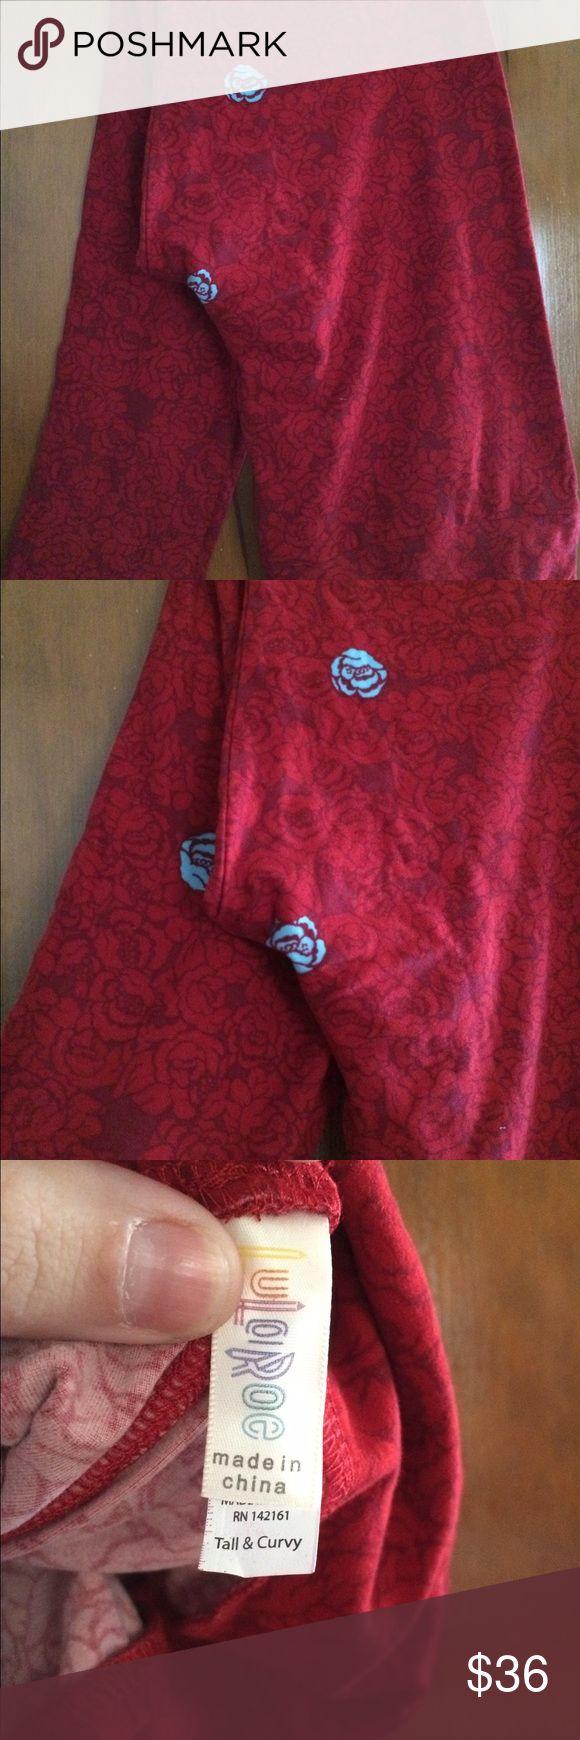 New lularoe TC leggings roses red with tags Brand new with tags- TC lularoe leggings! Pet free and smoke free home! LuLaRoe Pants Leggings